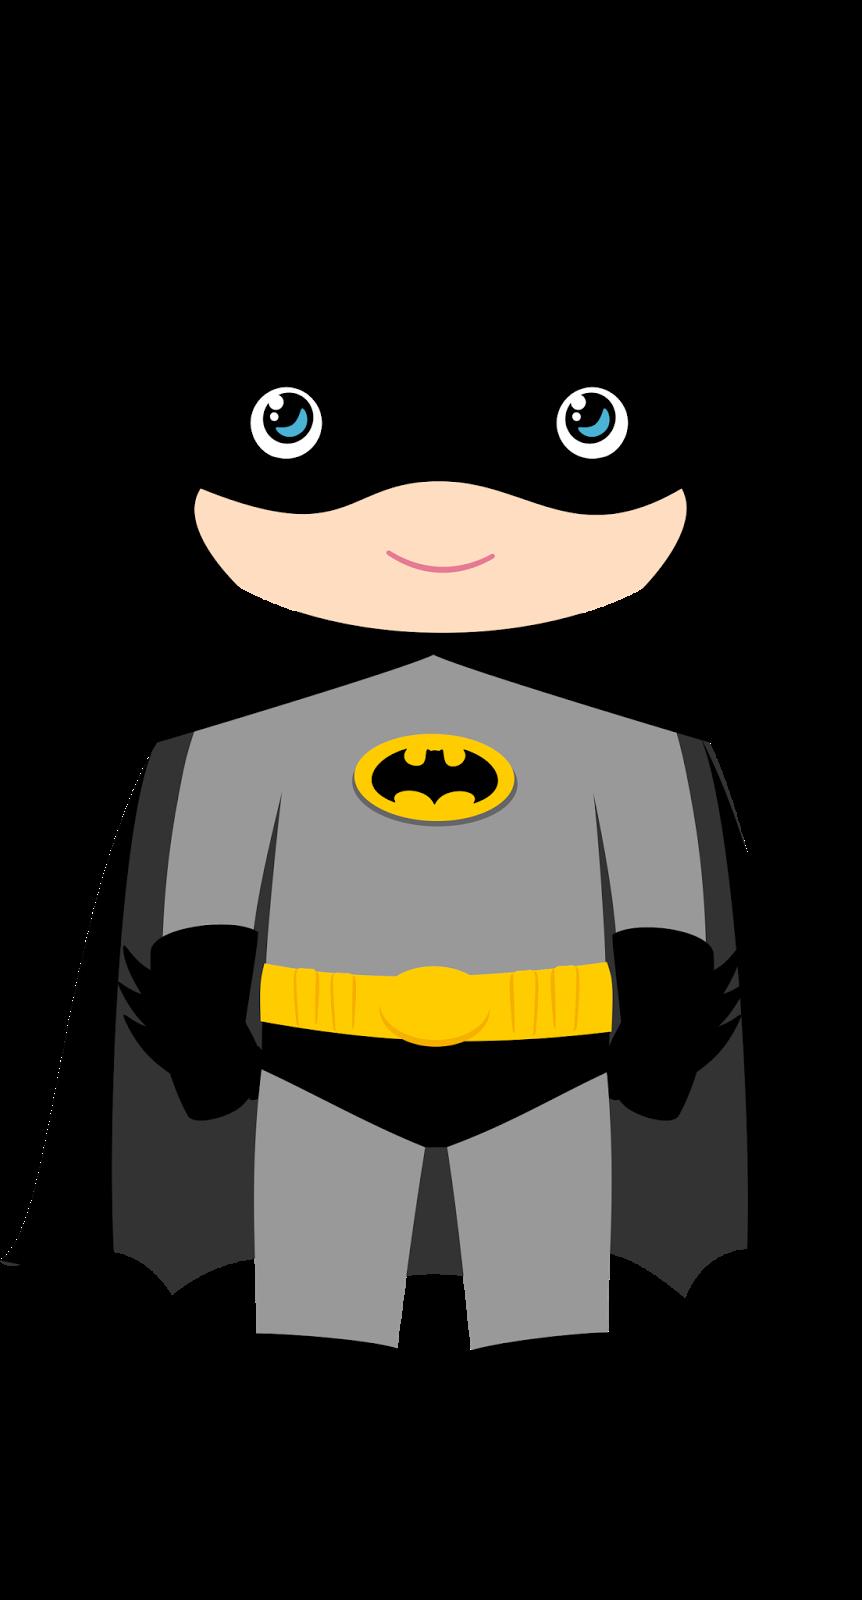 Batman clipart marvel superheroes Baby Characters Kids Batman Characters